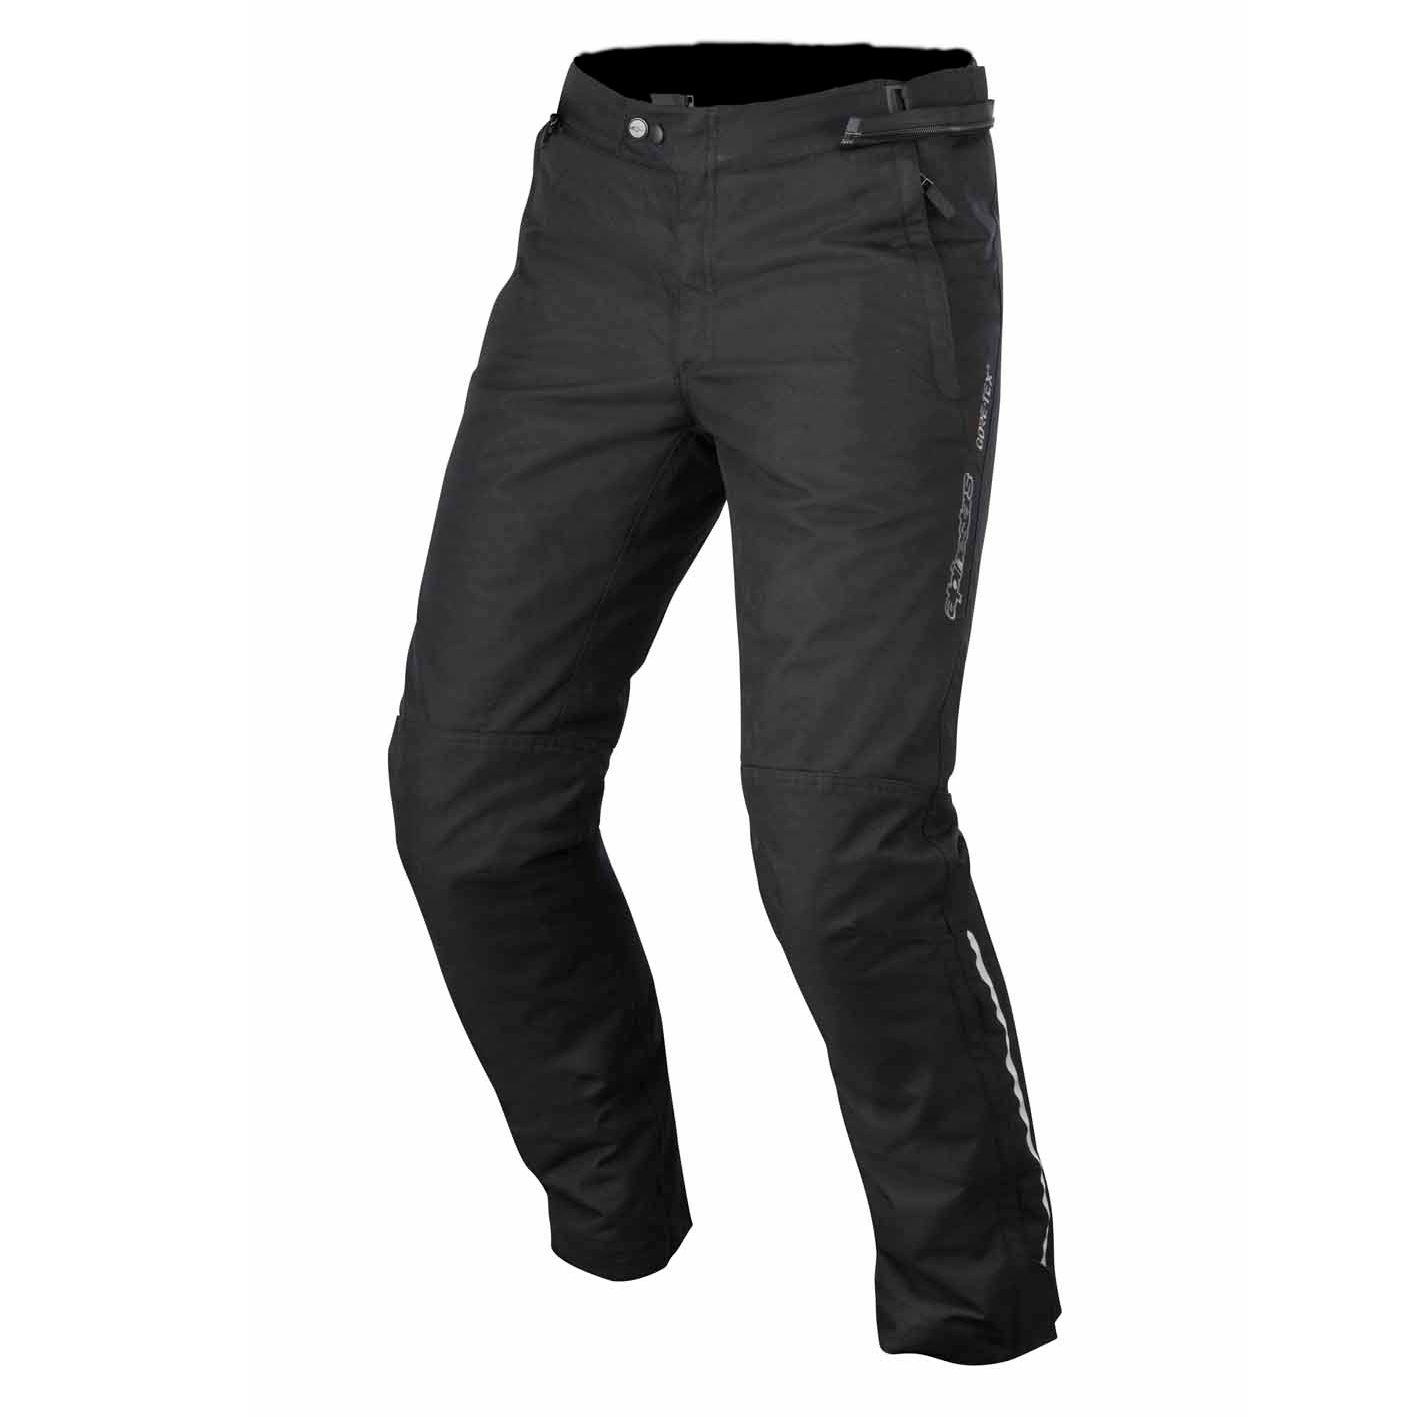 Pantalon moto : le port du pantalon moto